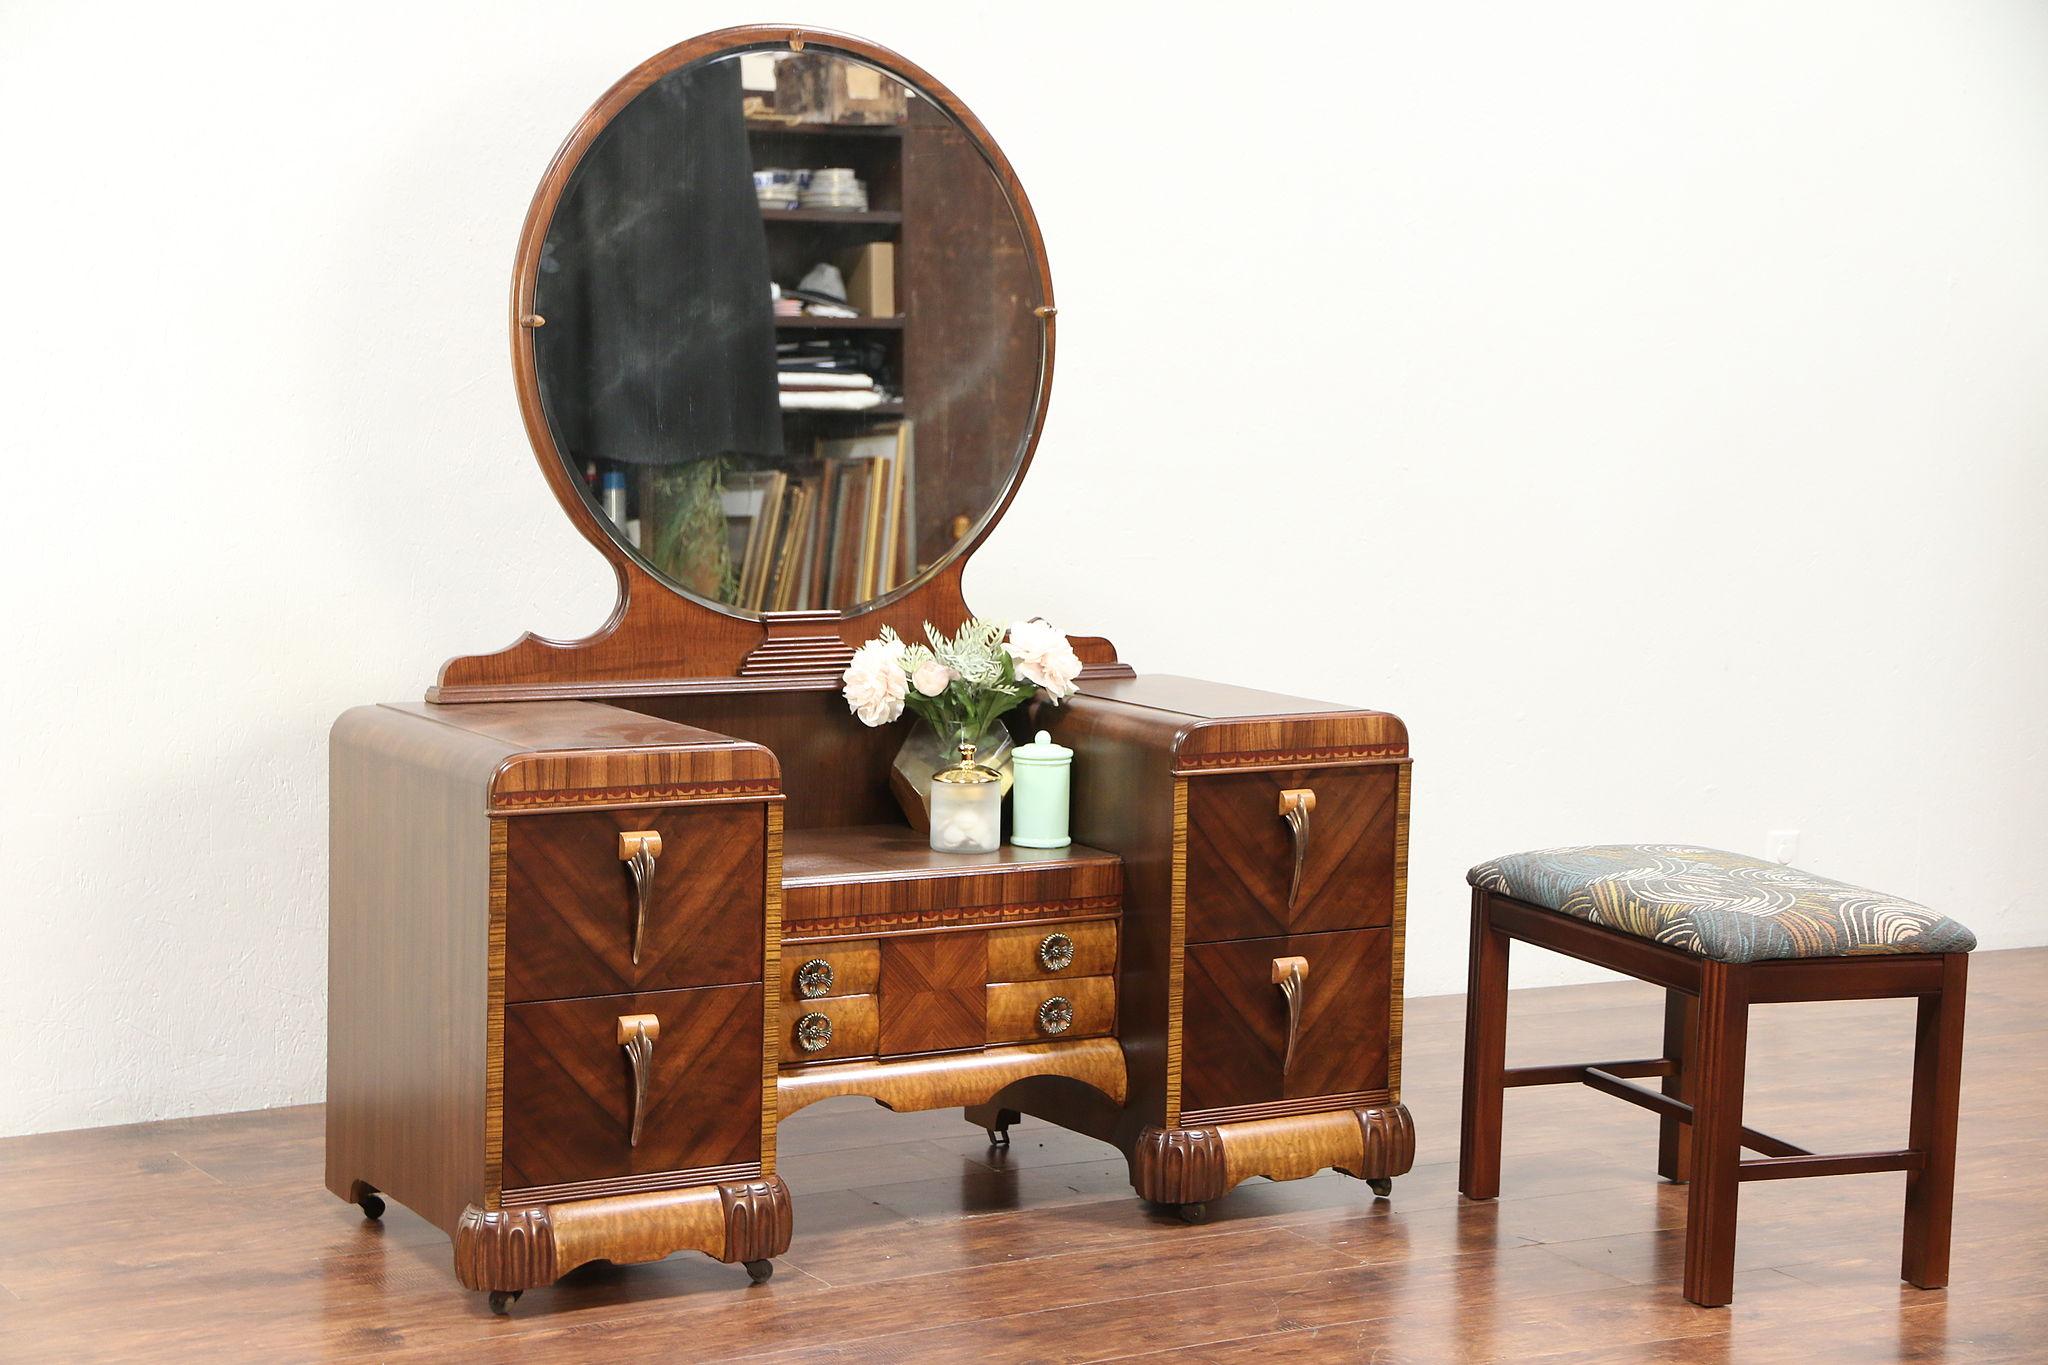 Art Deco Waterfall Vintage Vanity Or Dressing Table Mirror Bench 29429